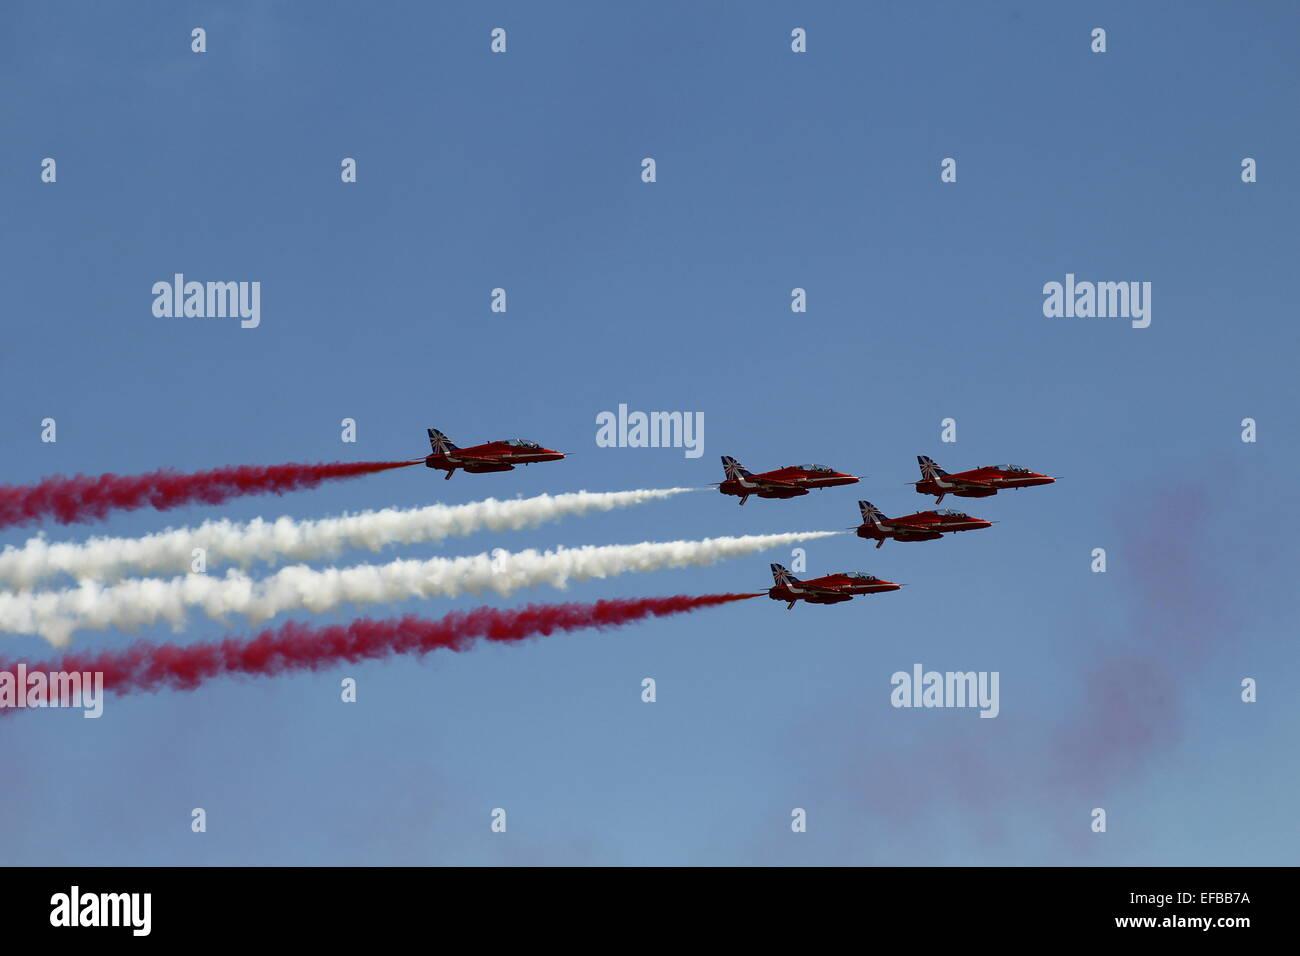 Red Arrows, Clacton Airshow, Clacton Pier. - Stock Image